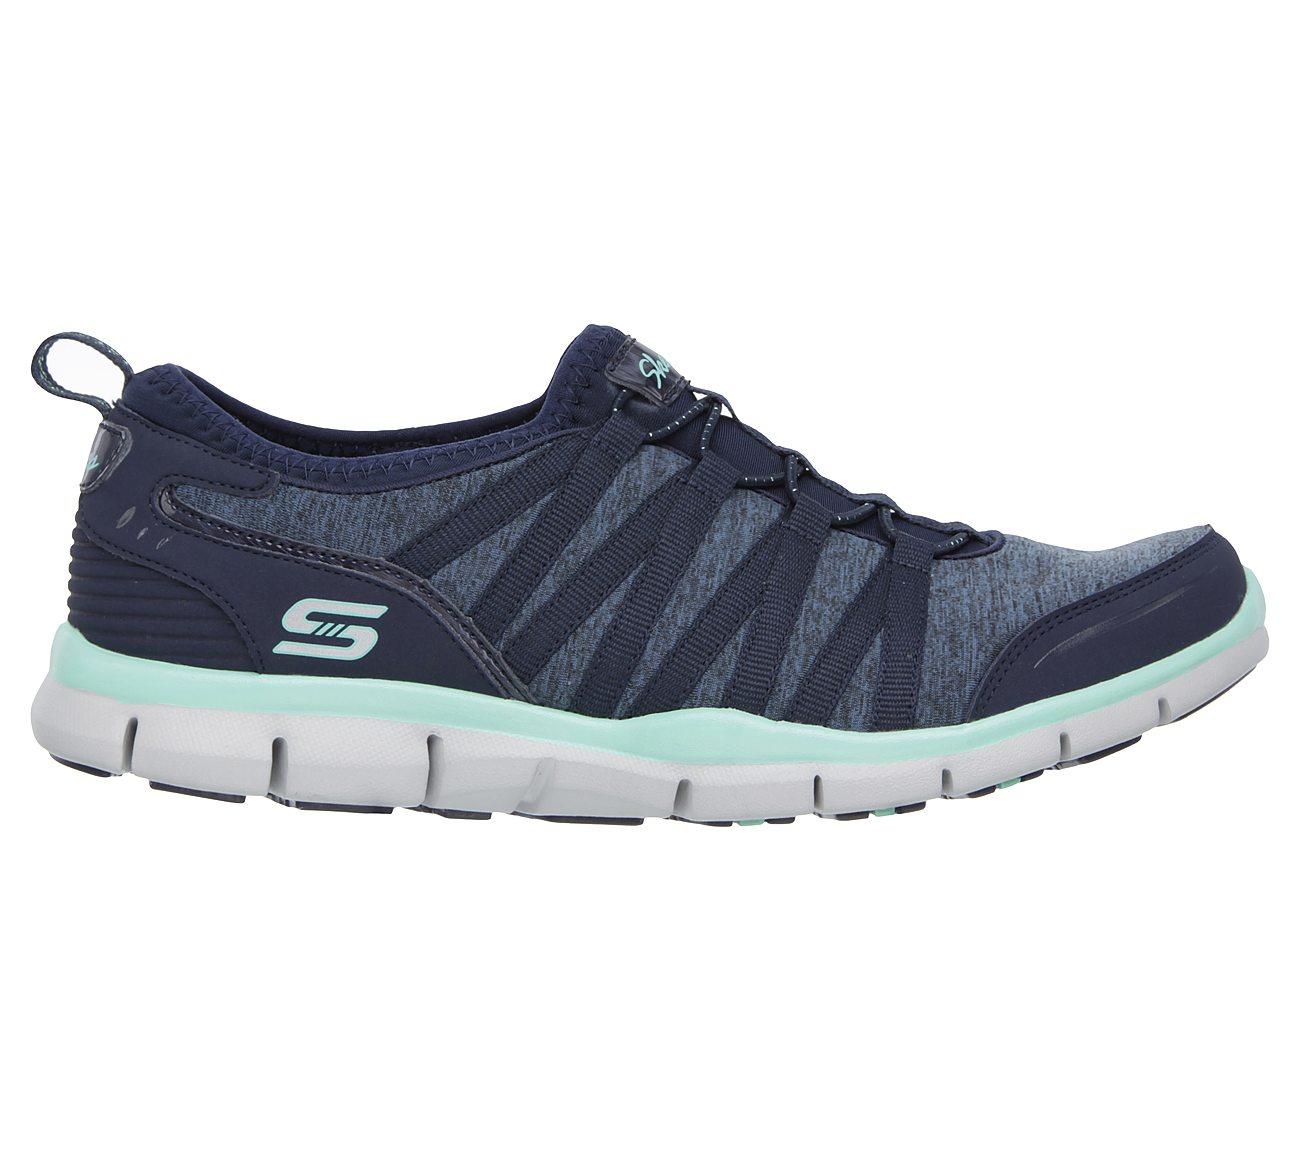 214fcc96784e Buy SKECHERS Gratis - Shake It Off Sport Active Shoes only  70.00